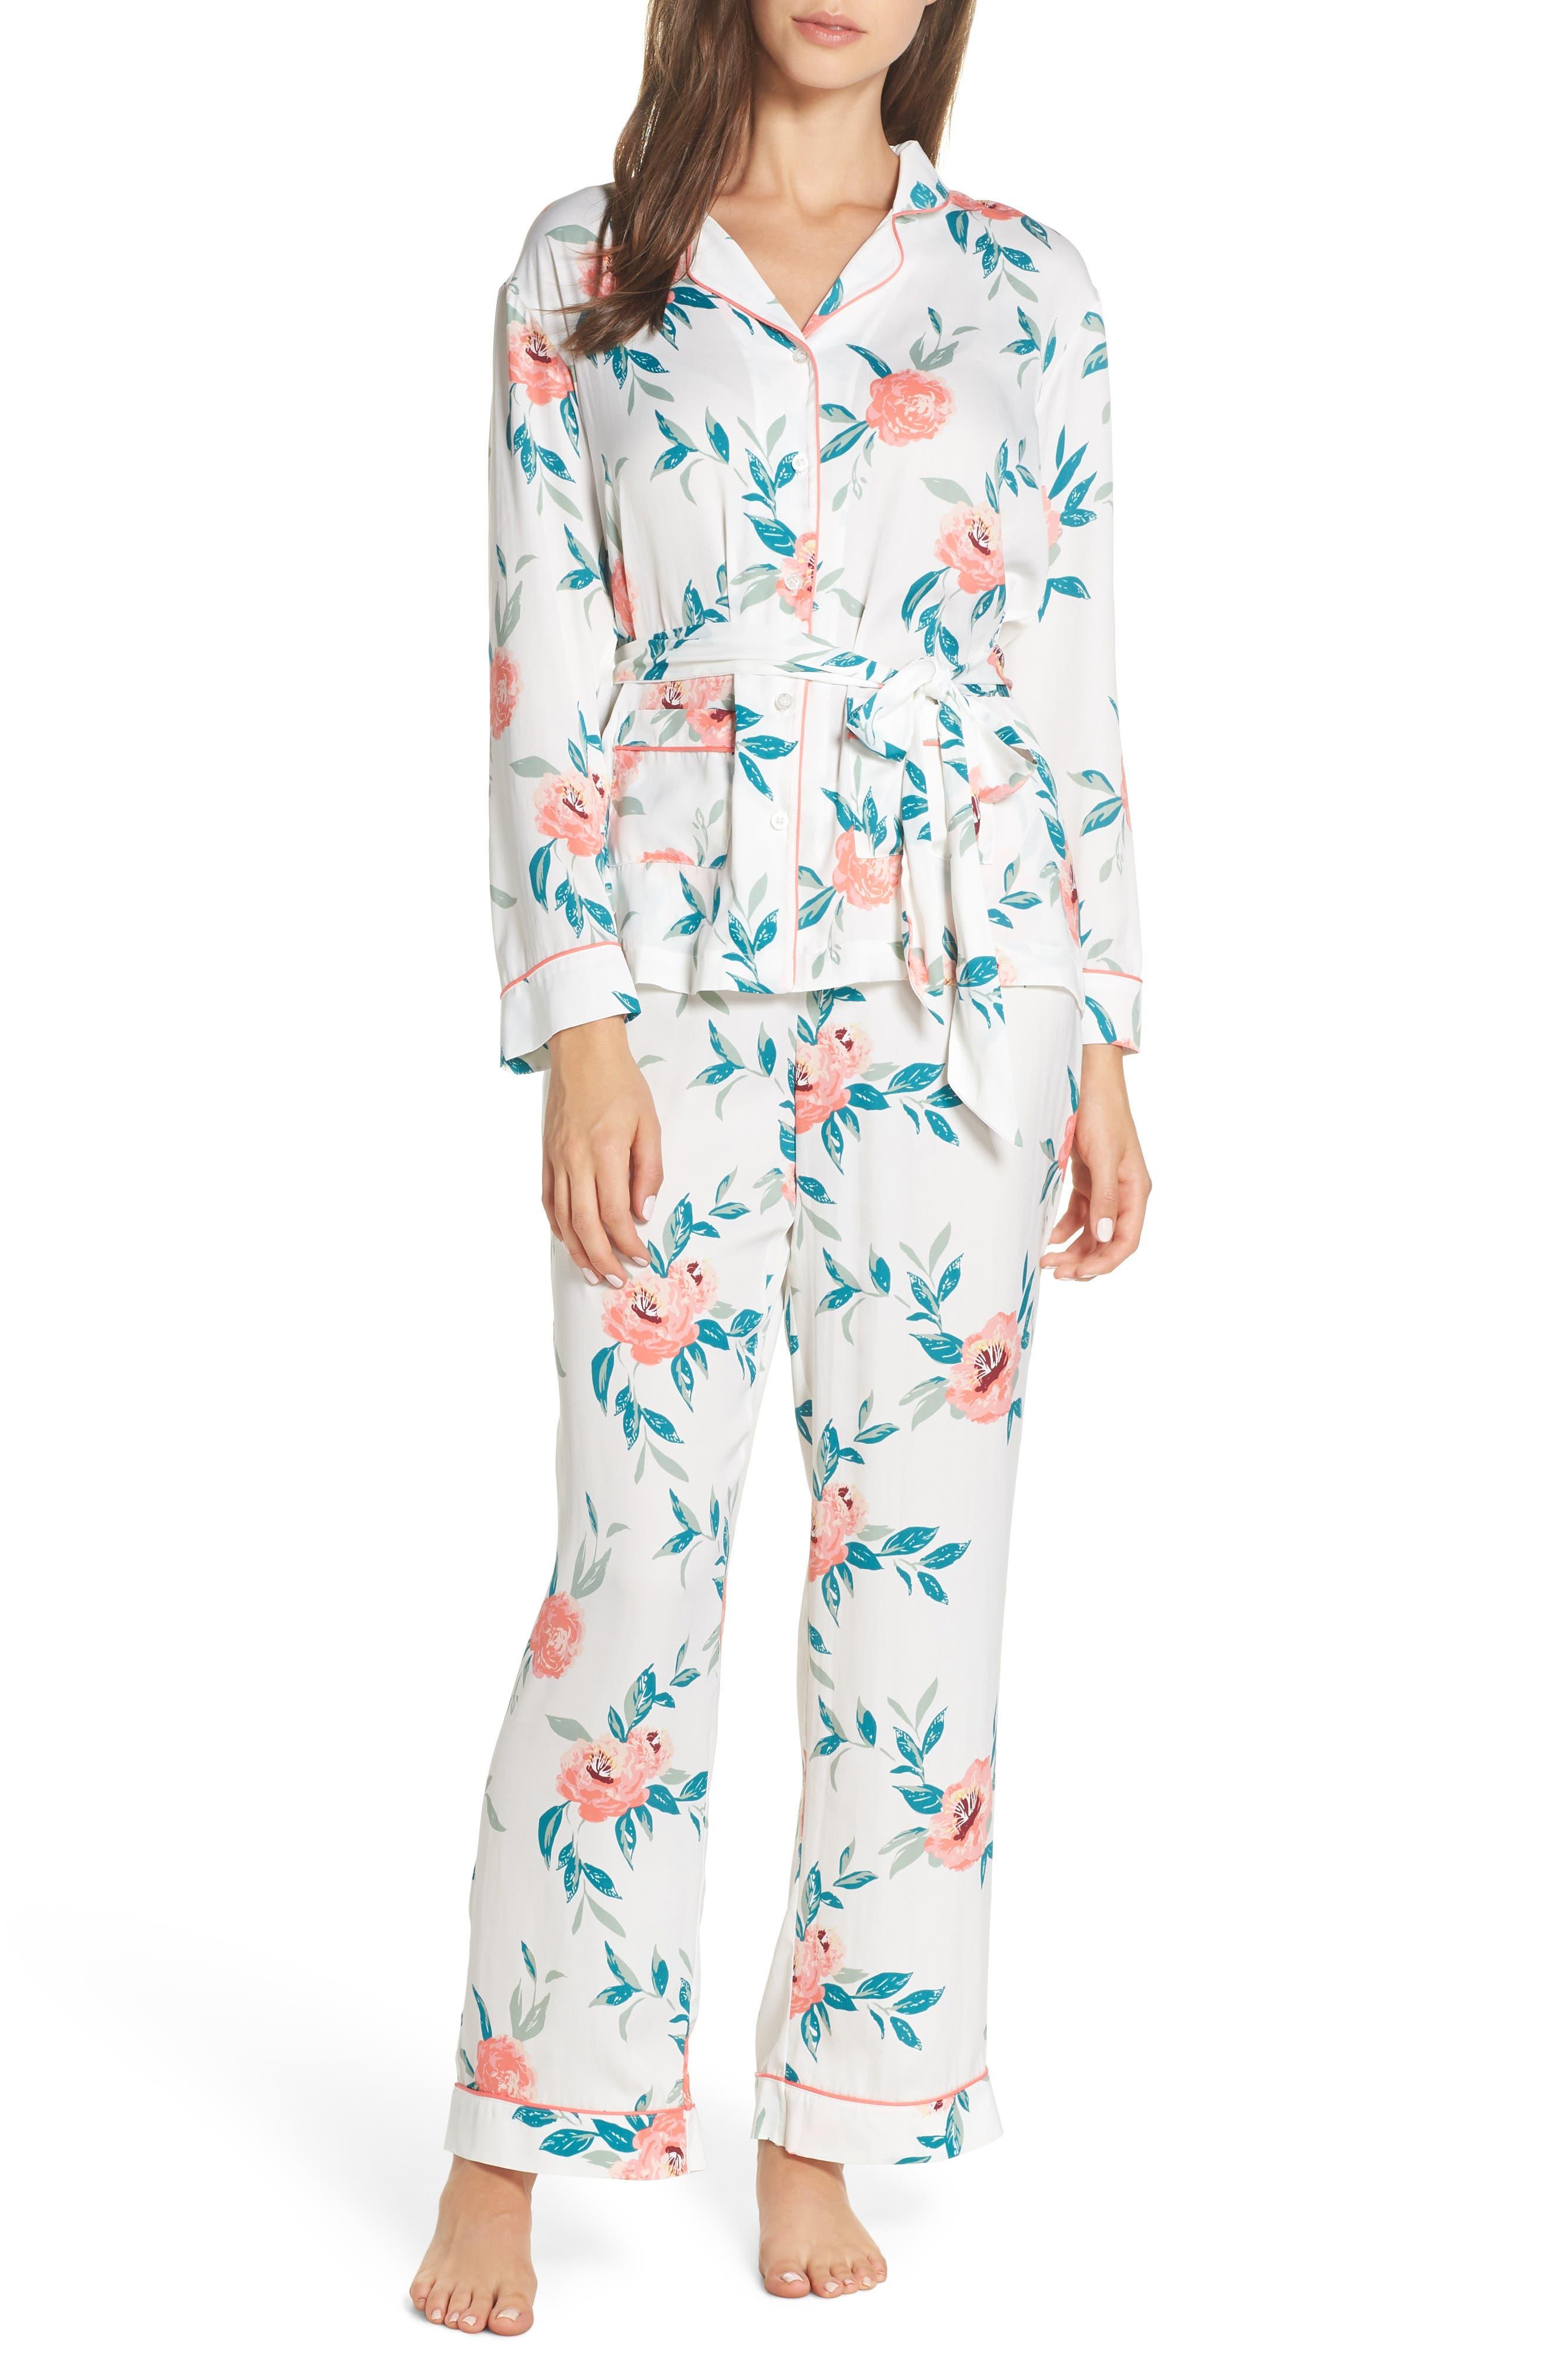 NORDSTROM LINGERIE, Sweet Dreams Wrap Pajamas, Main thumbnail 1, color, 100